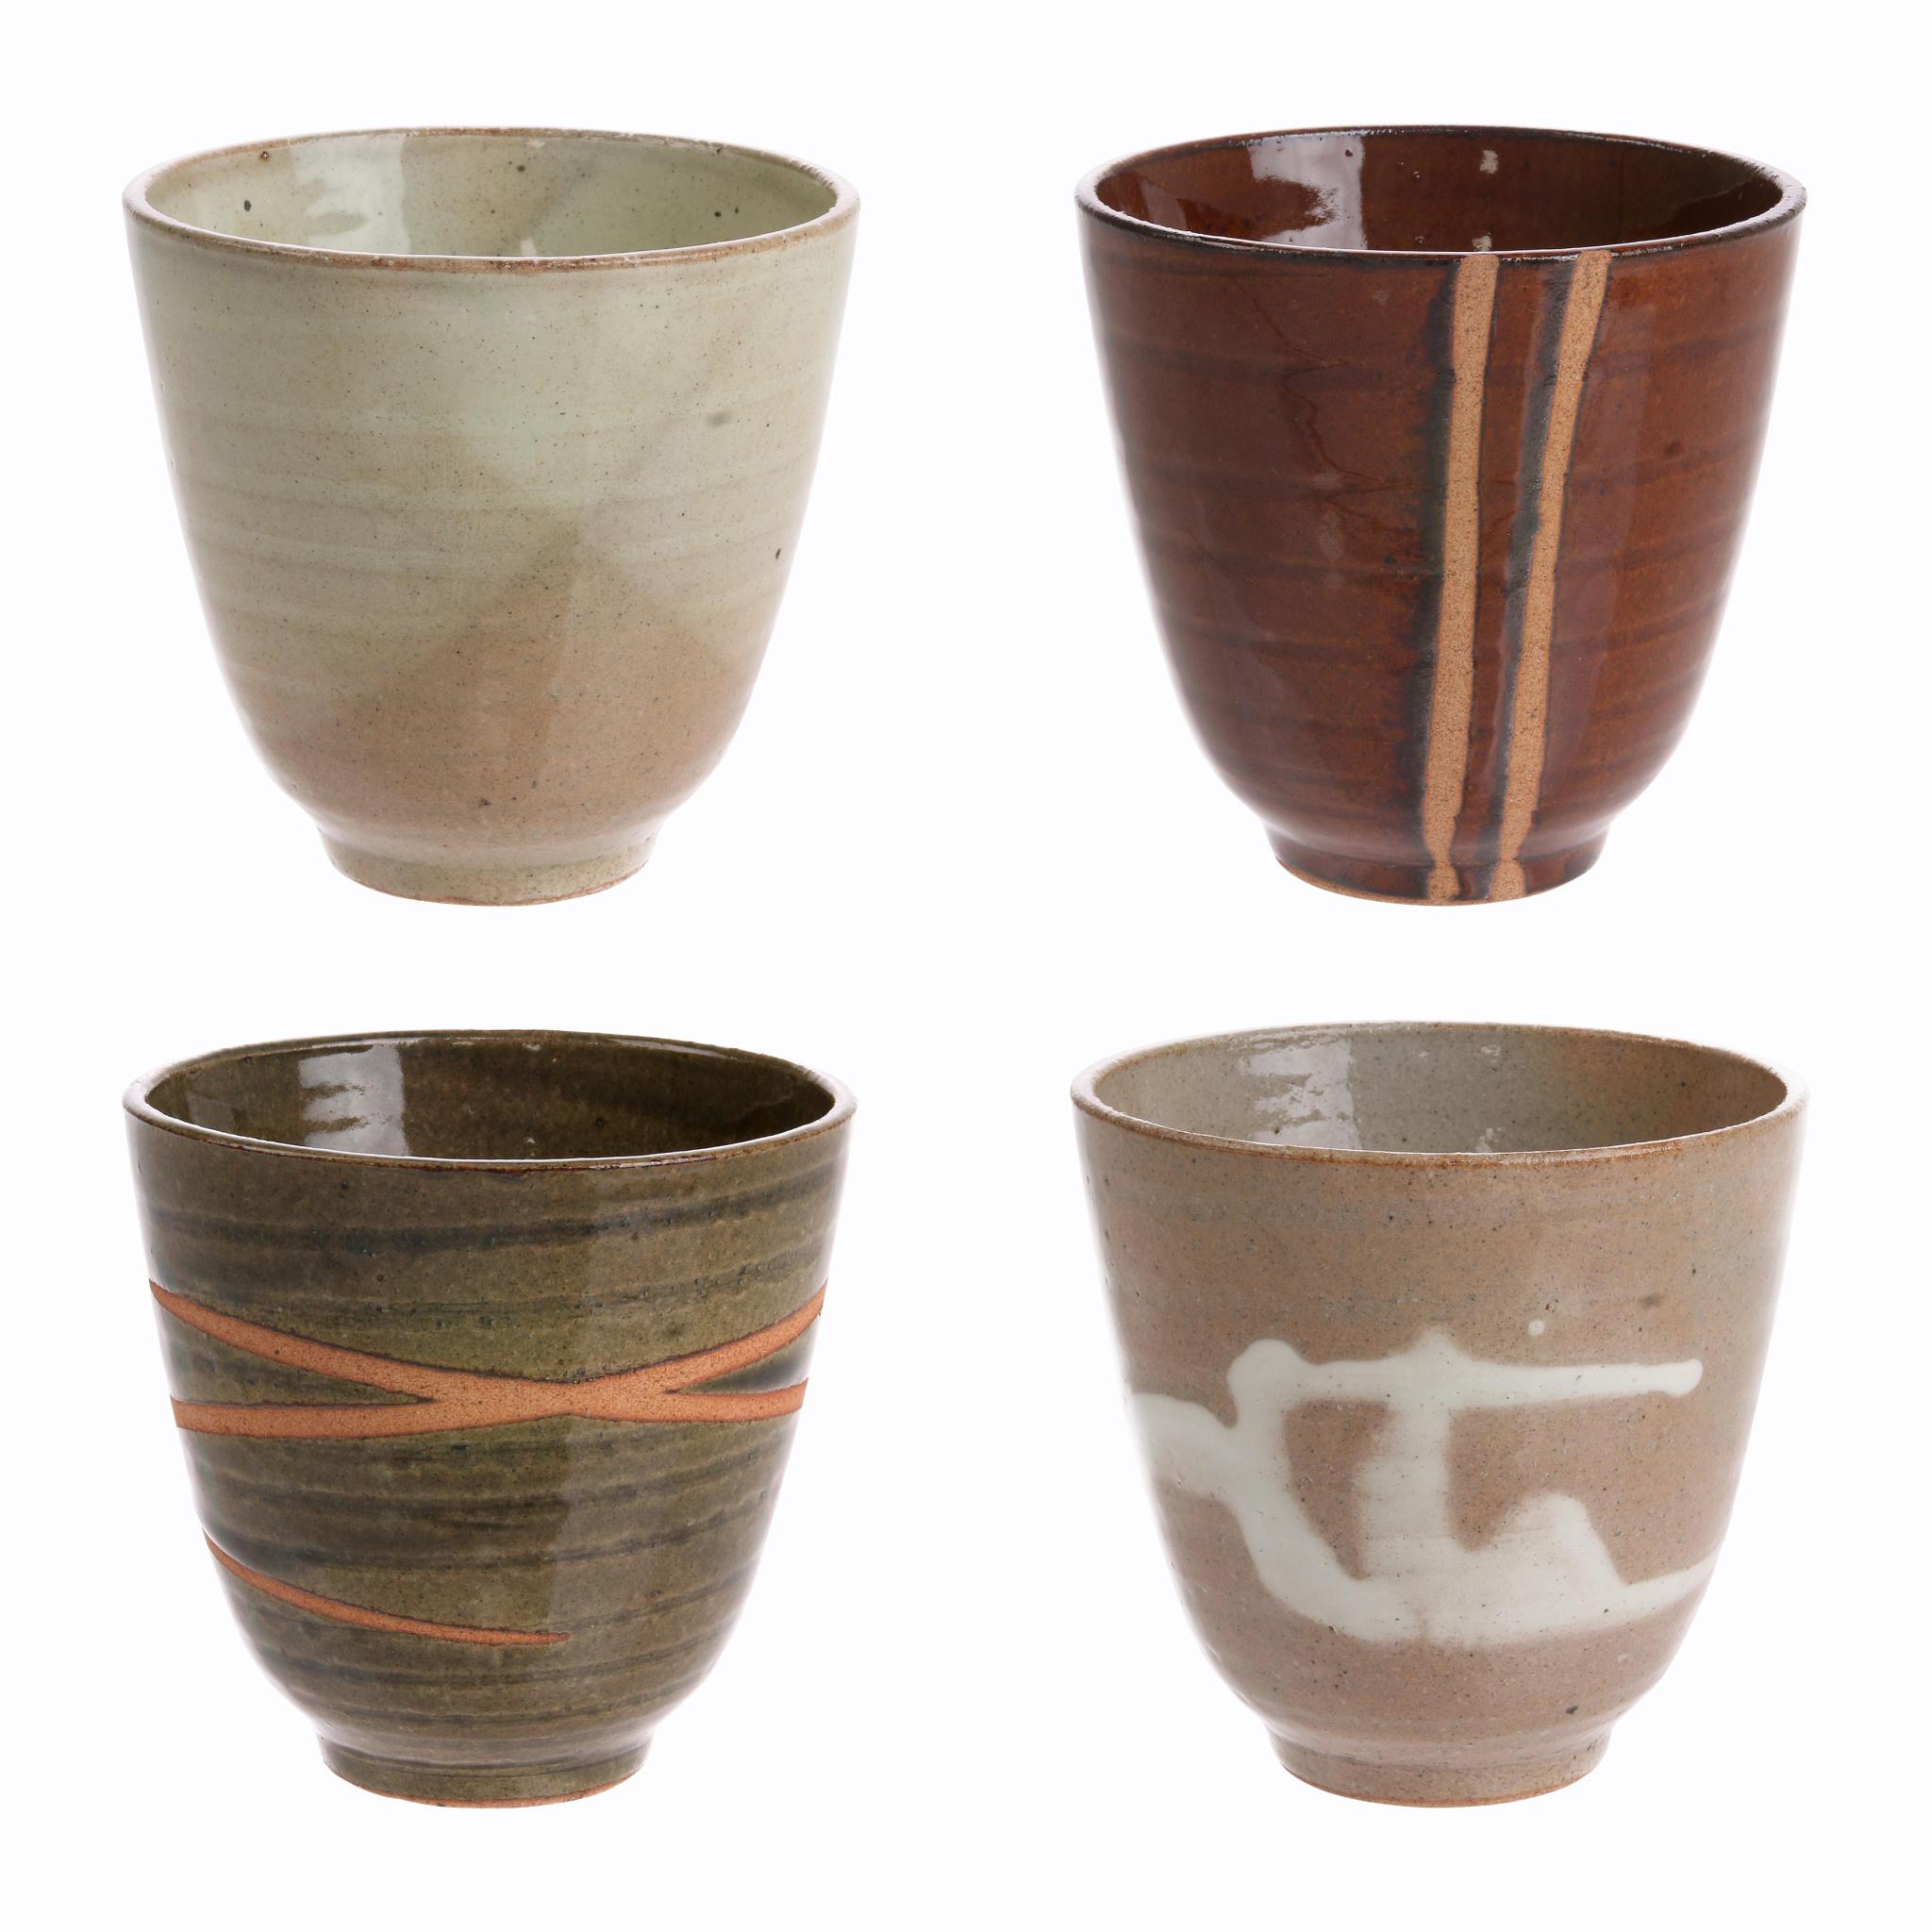 Mok kyoto ceramics: japanese yunomi mugs green-2